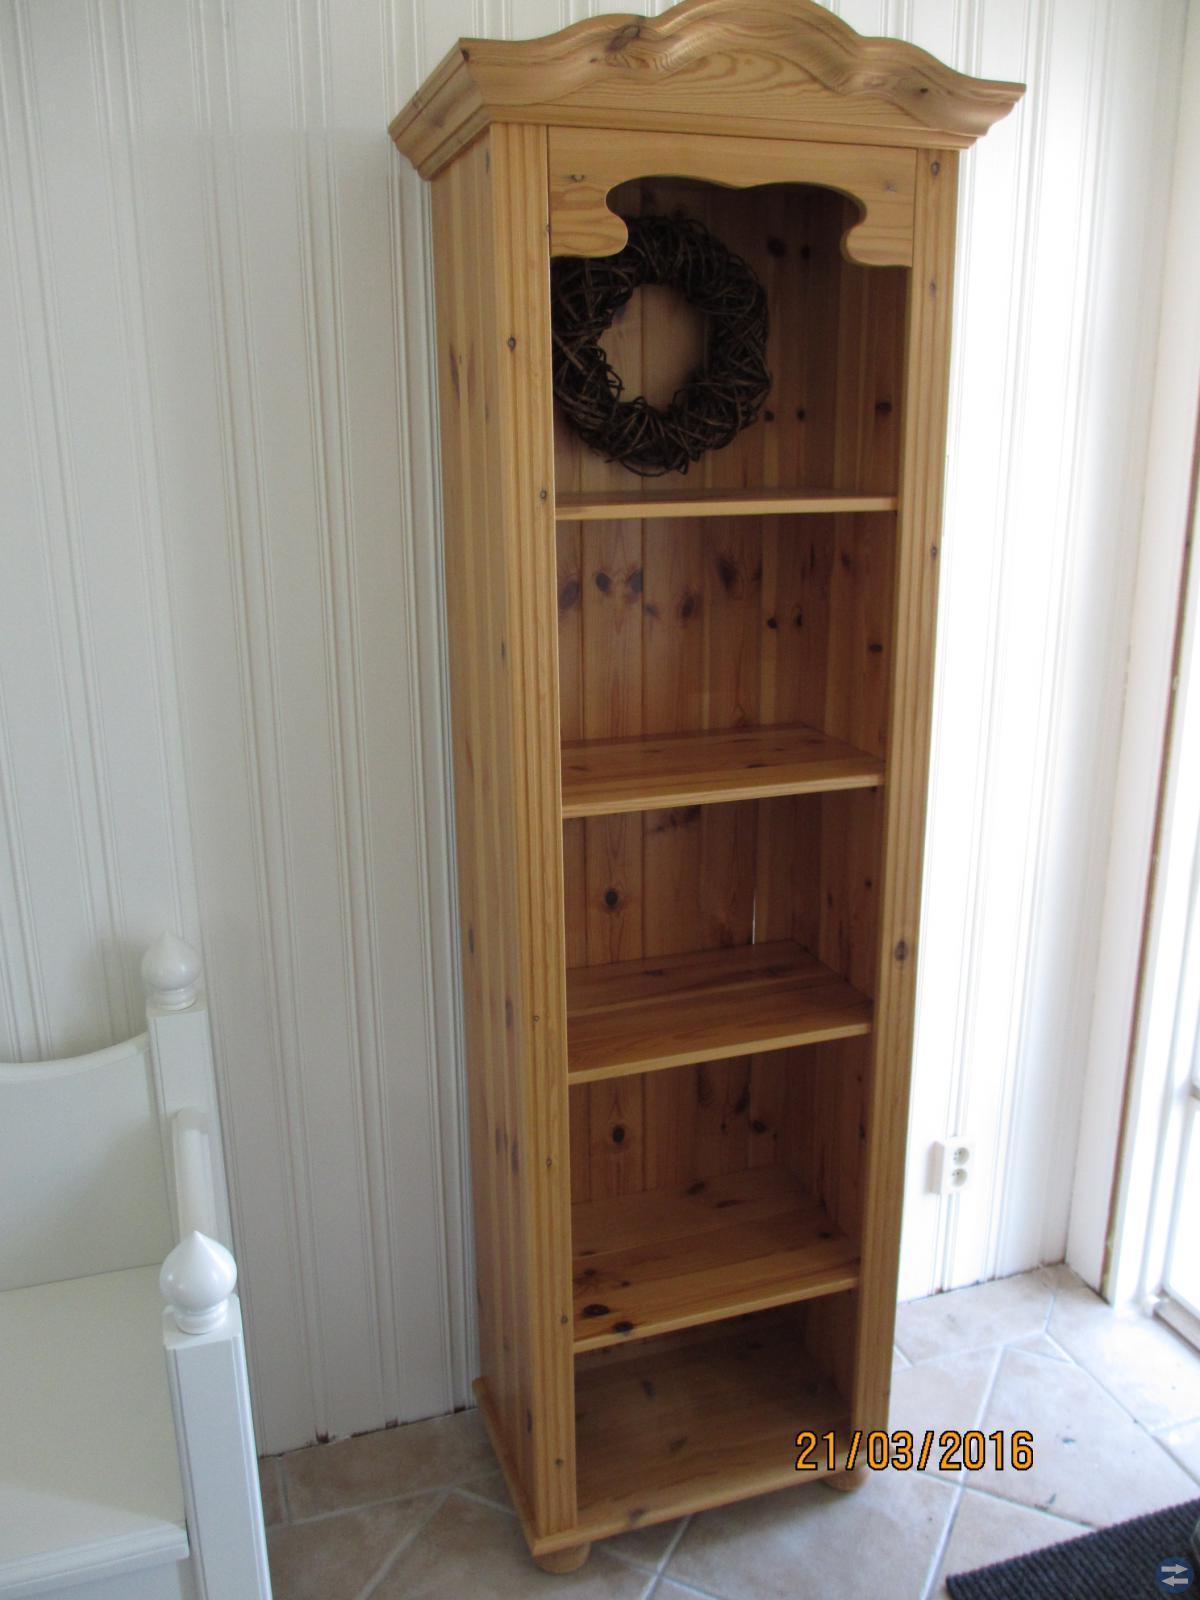 Lättplacerad bokhylla / prydnadshylla